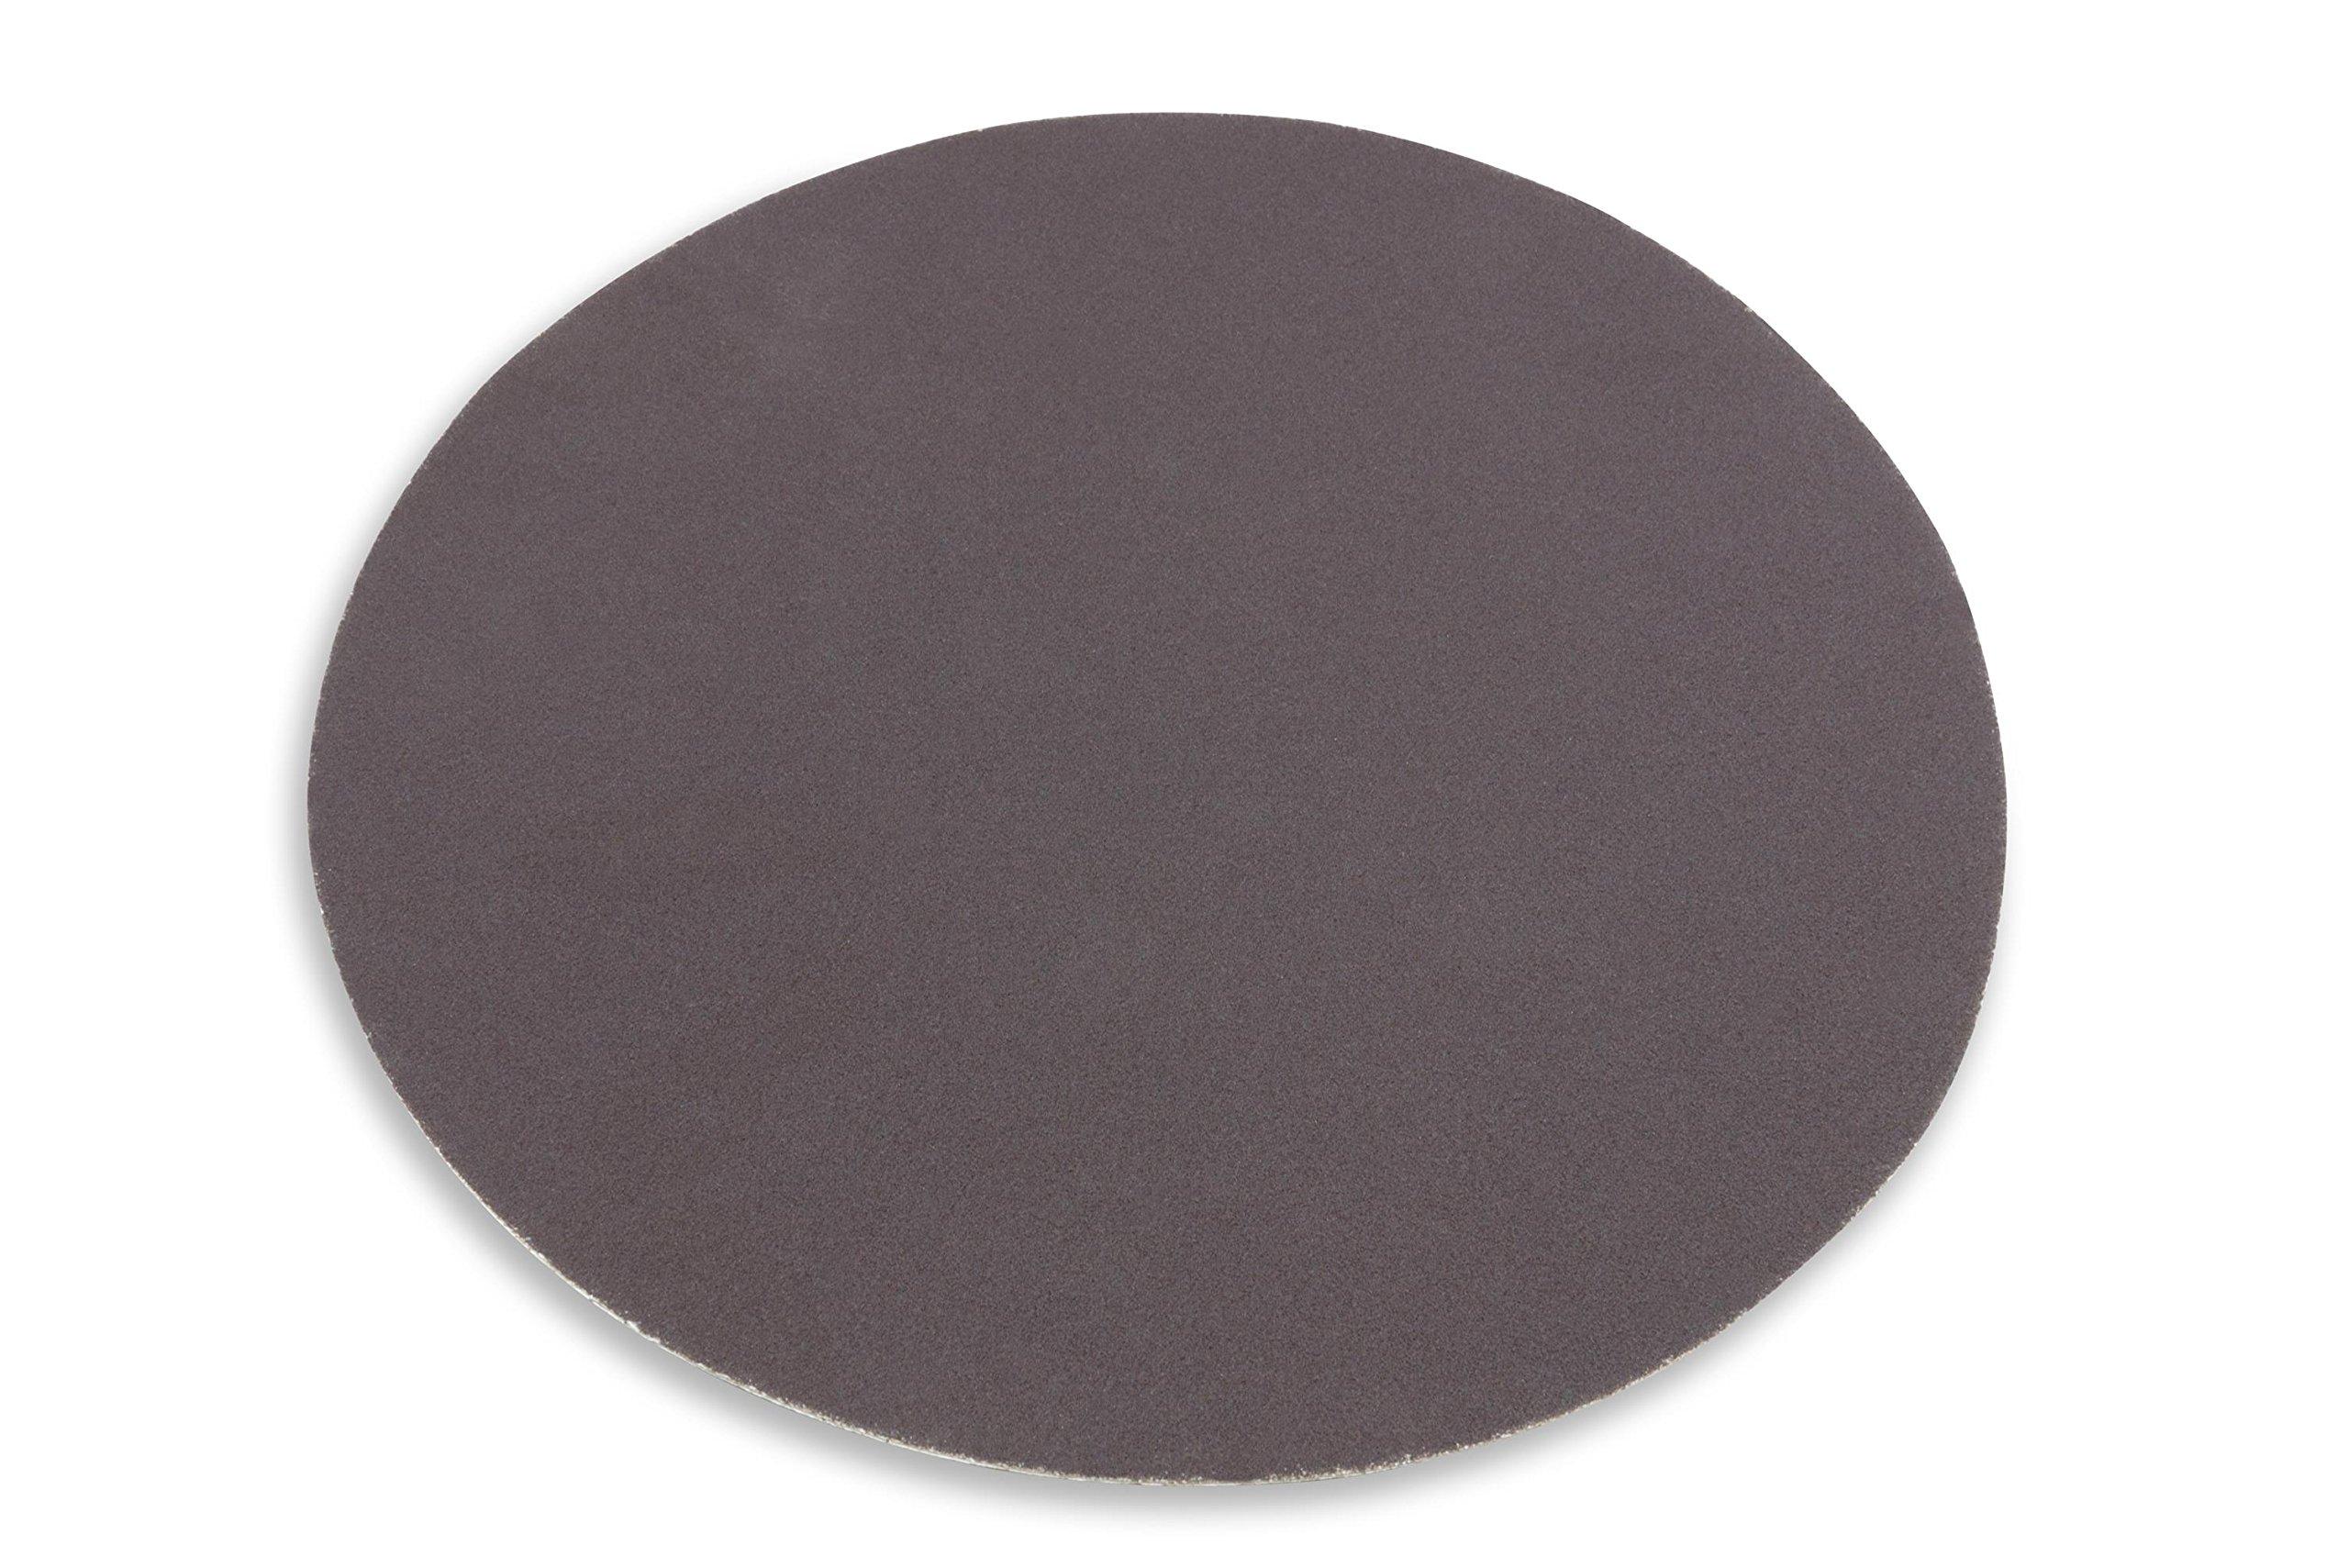 14 Inch 80 Grit Adhesive Back Aluminum Oxide metal Sanding Disc